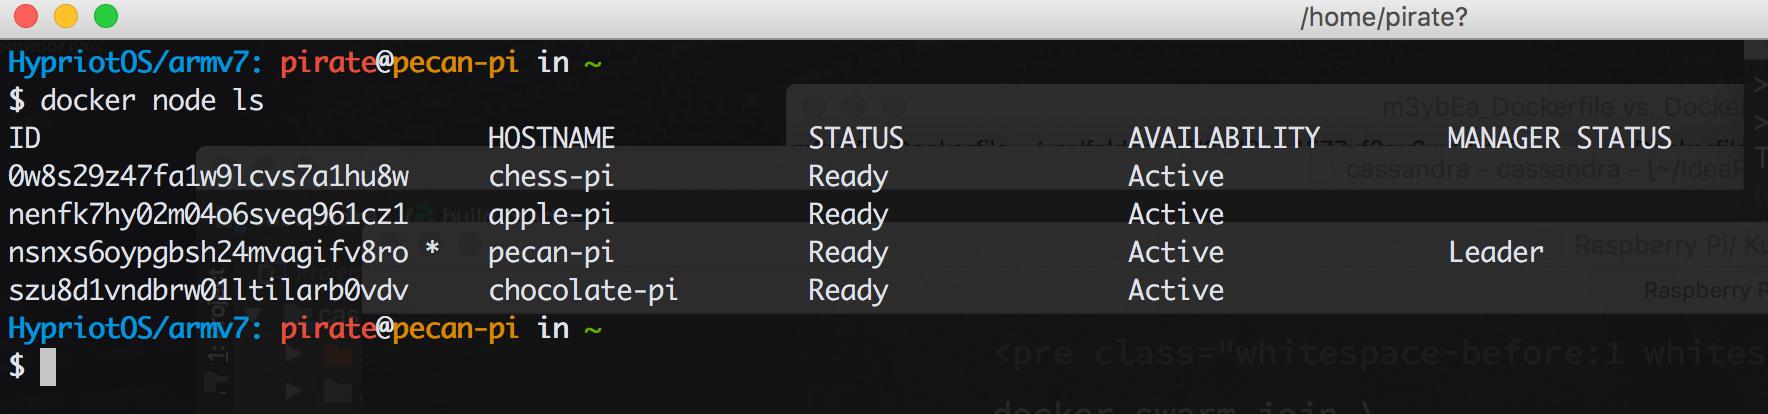 docker node ls